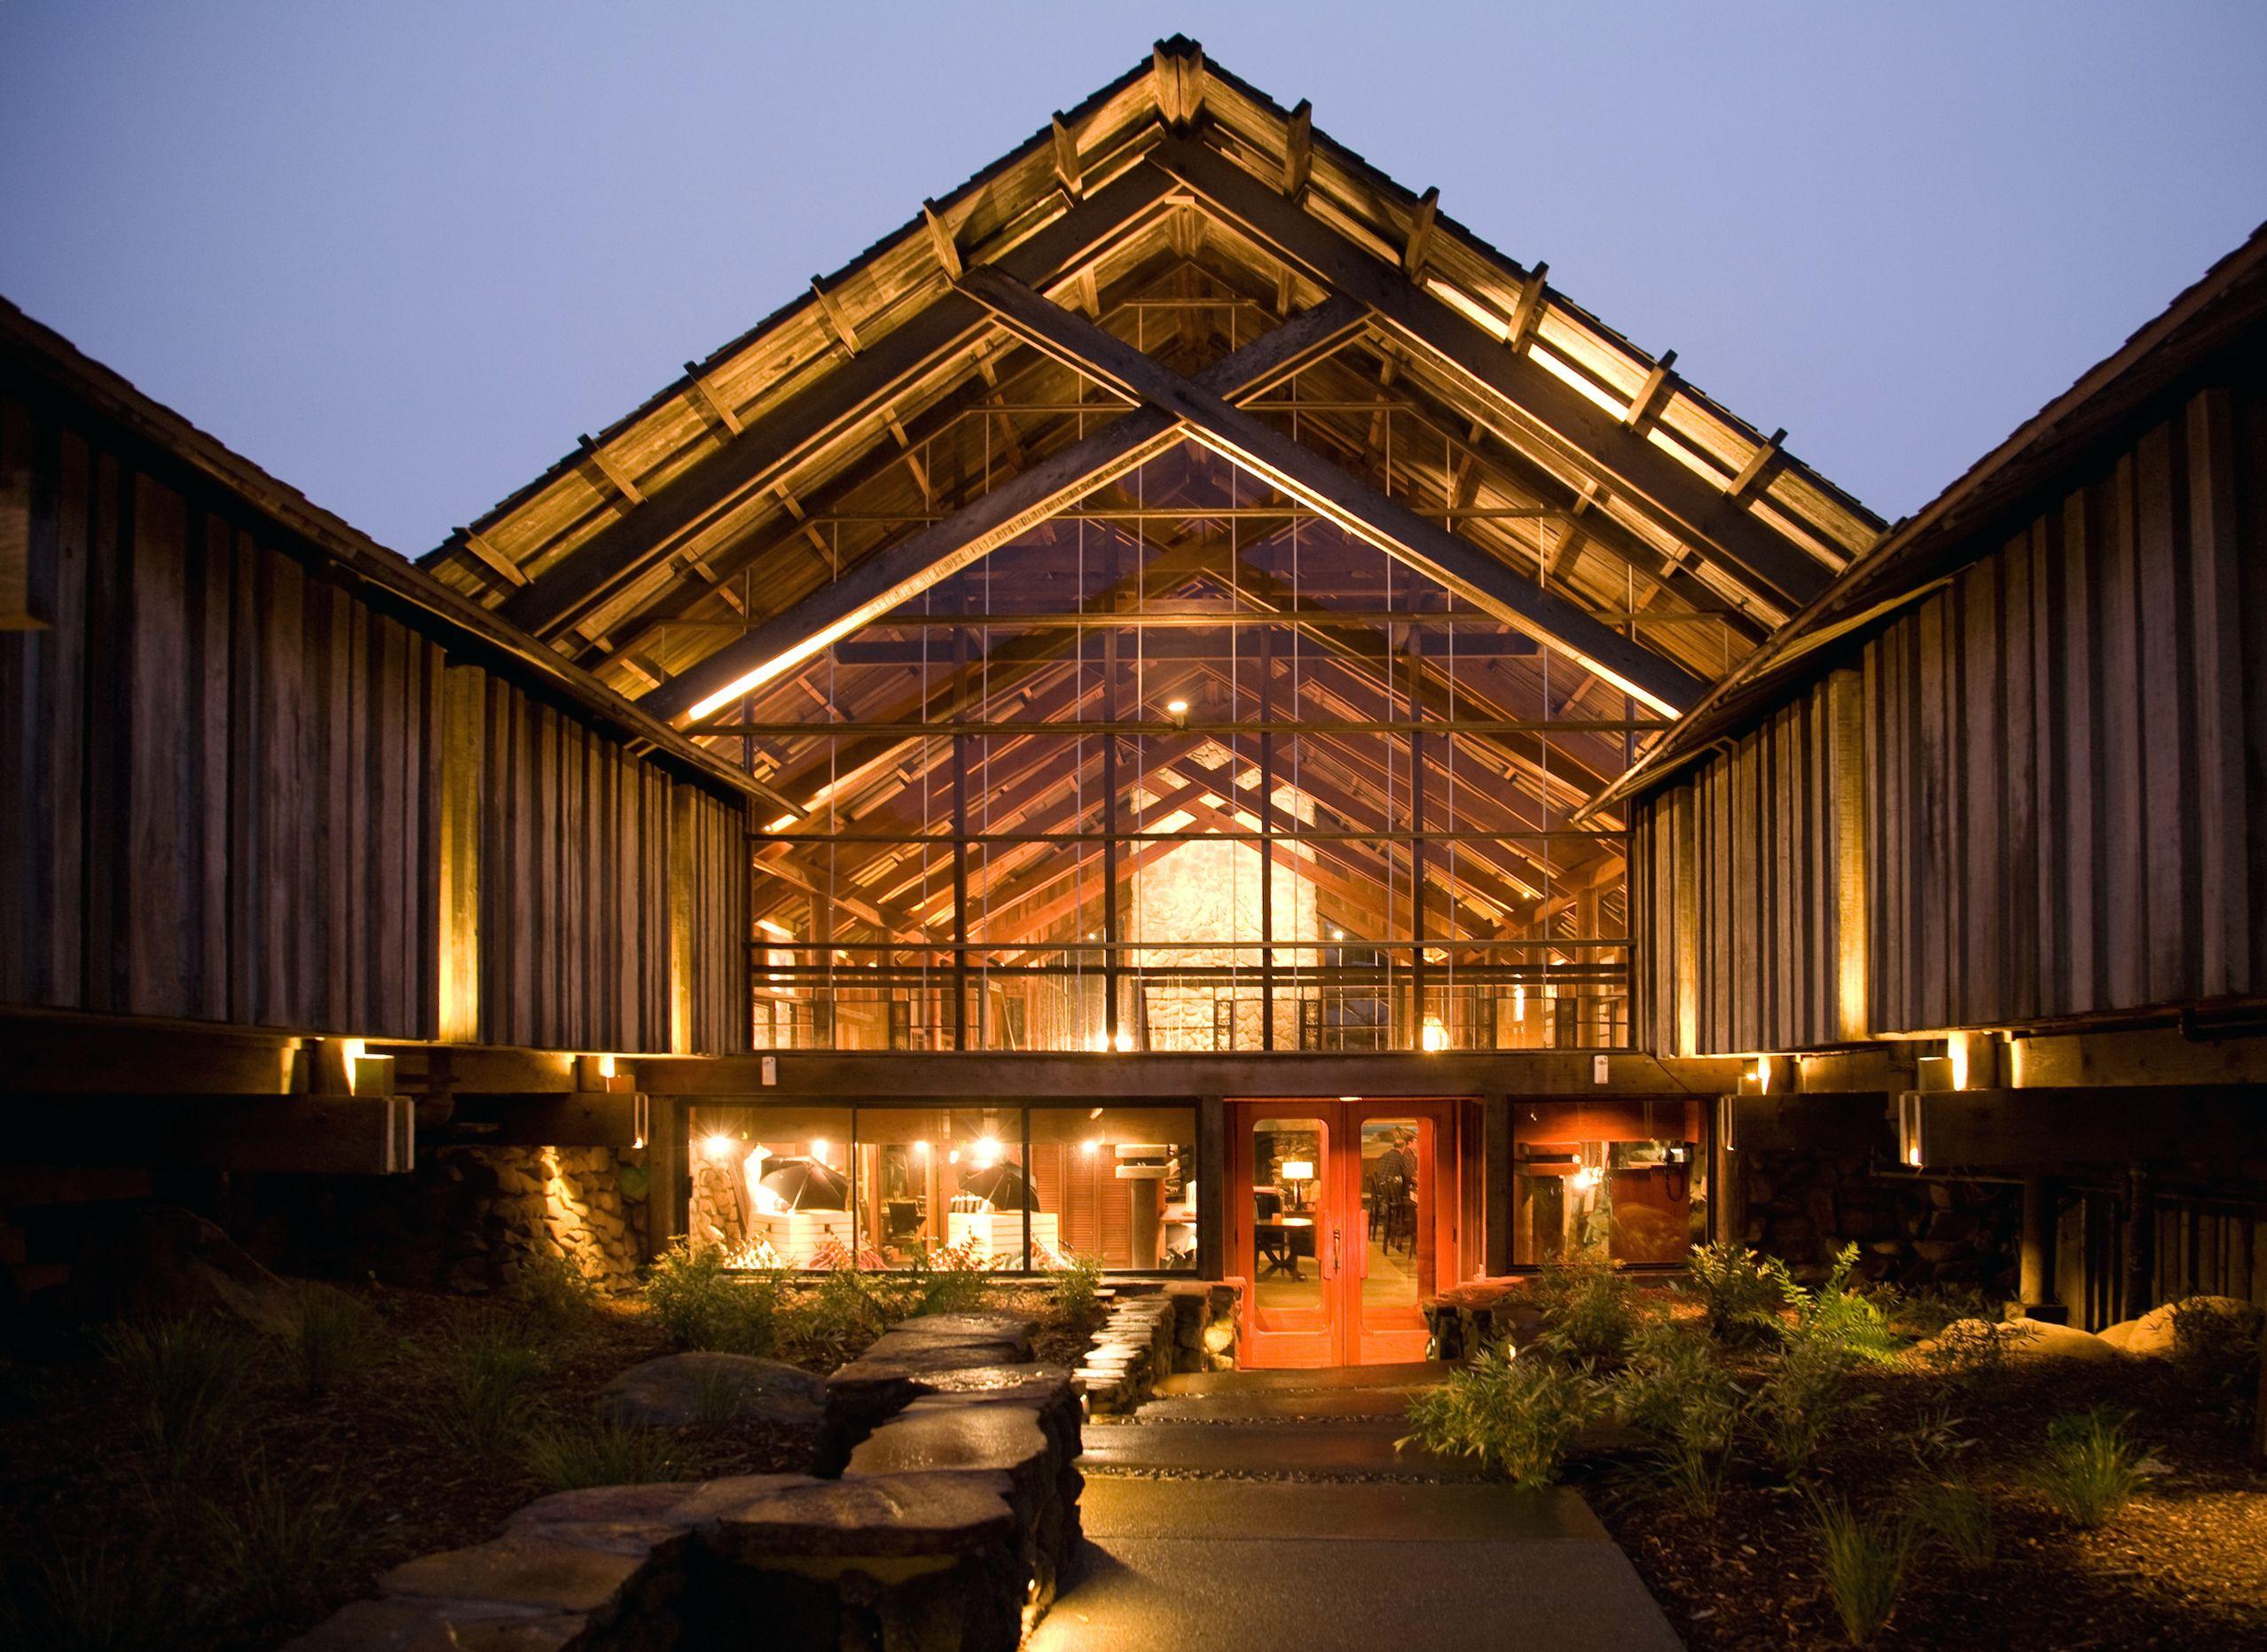 Dusk at Timber Cove Inn Sonoma coast, California hotel